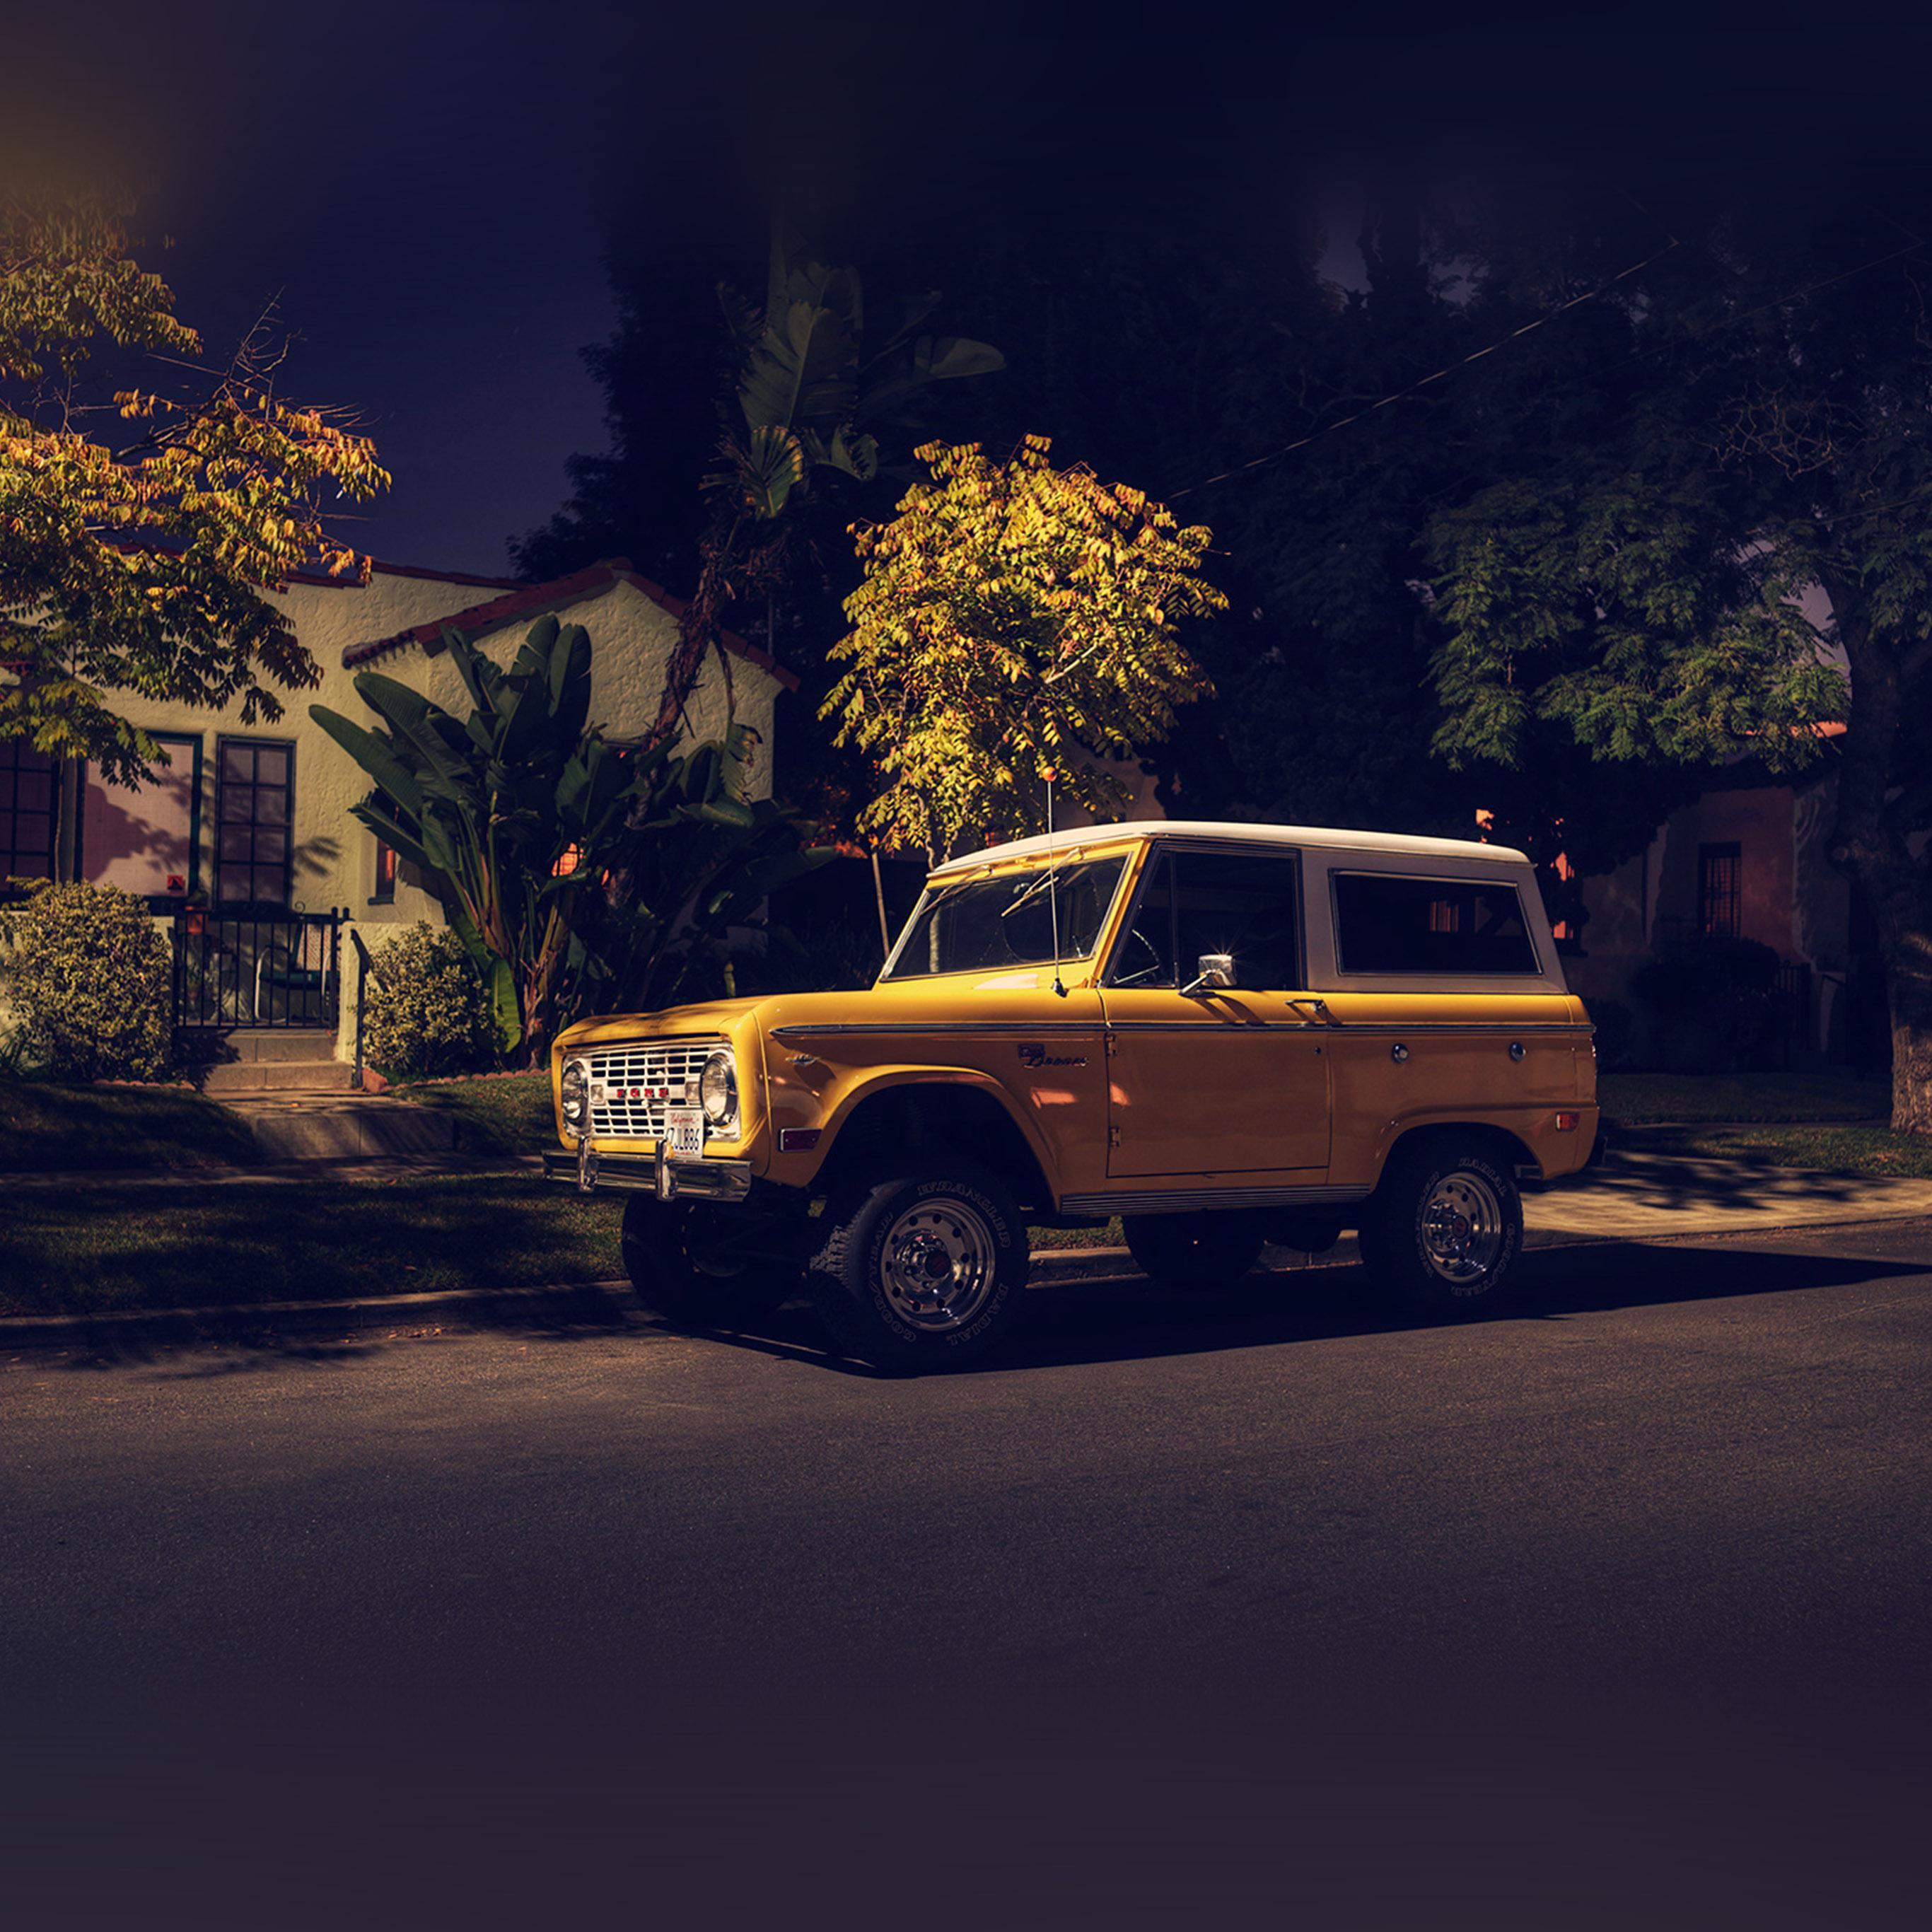 Bf64-car-jeep-night-photo-city-art-wallpaper